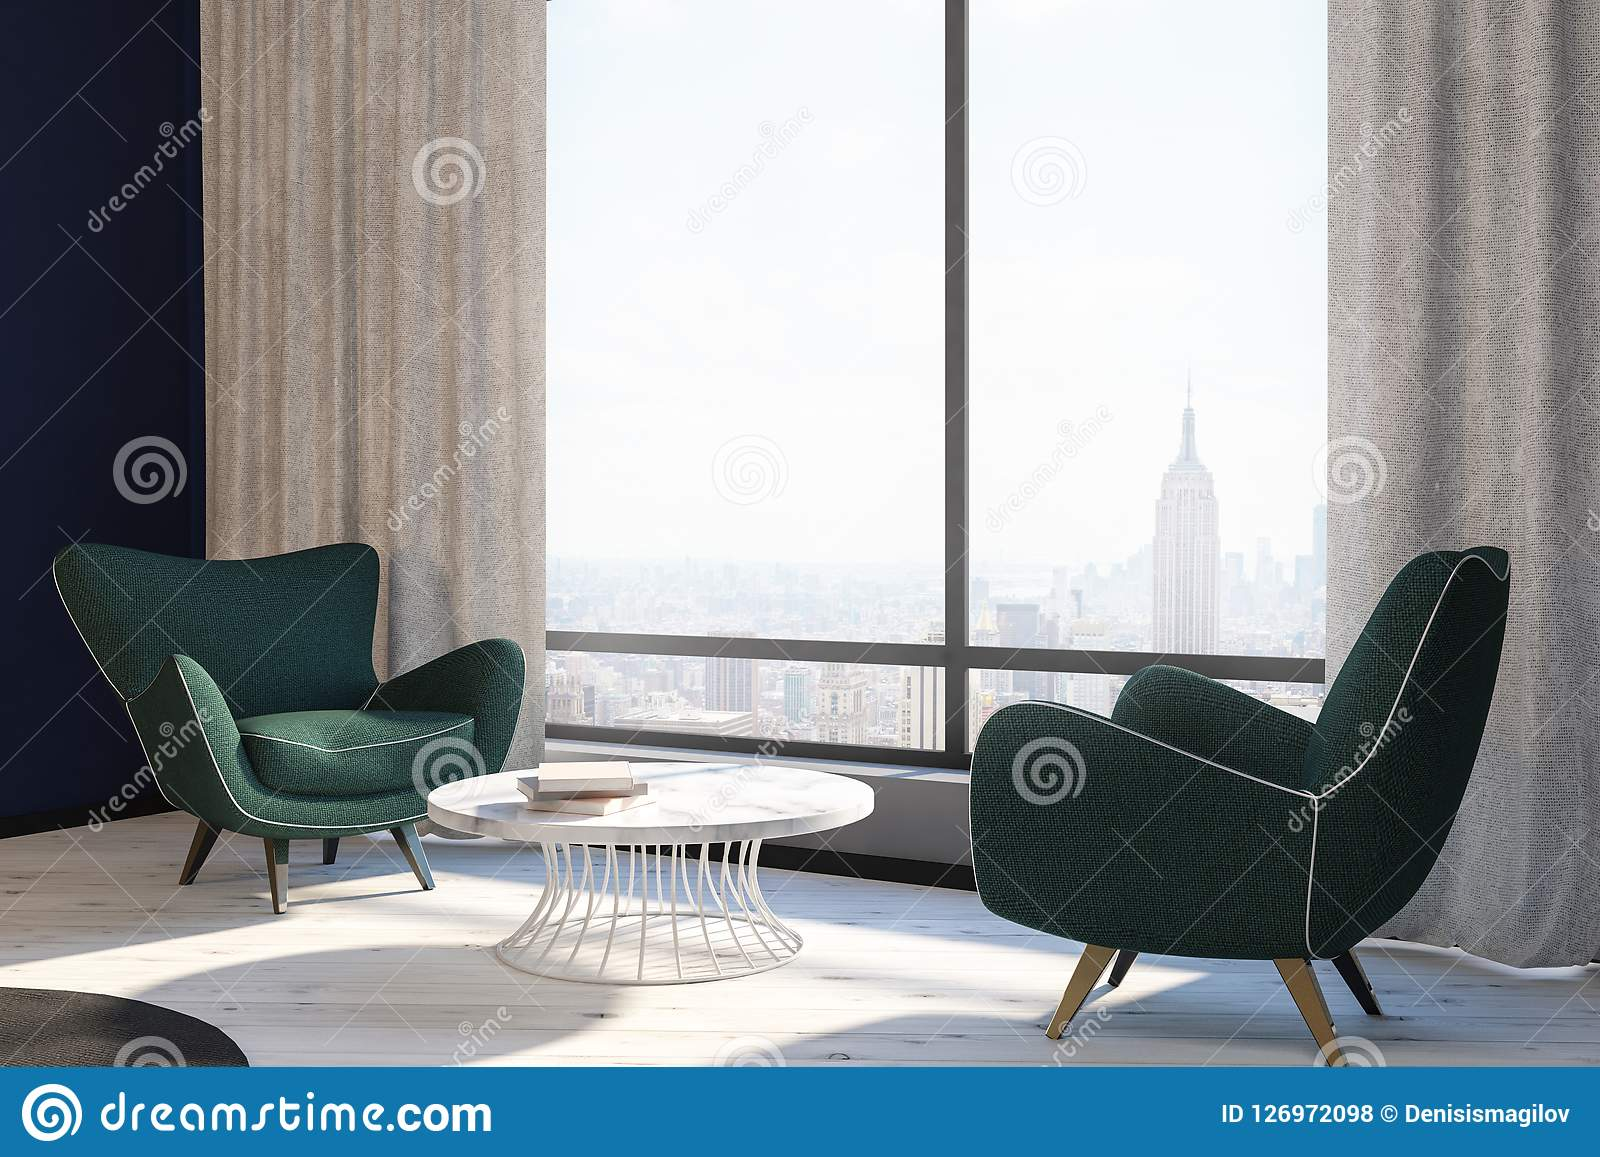 Dark Green Armchair Living Room Interior Side View Stock ...